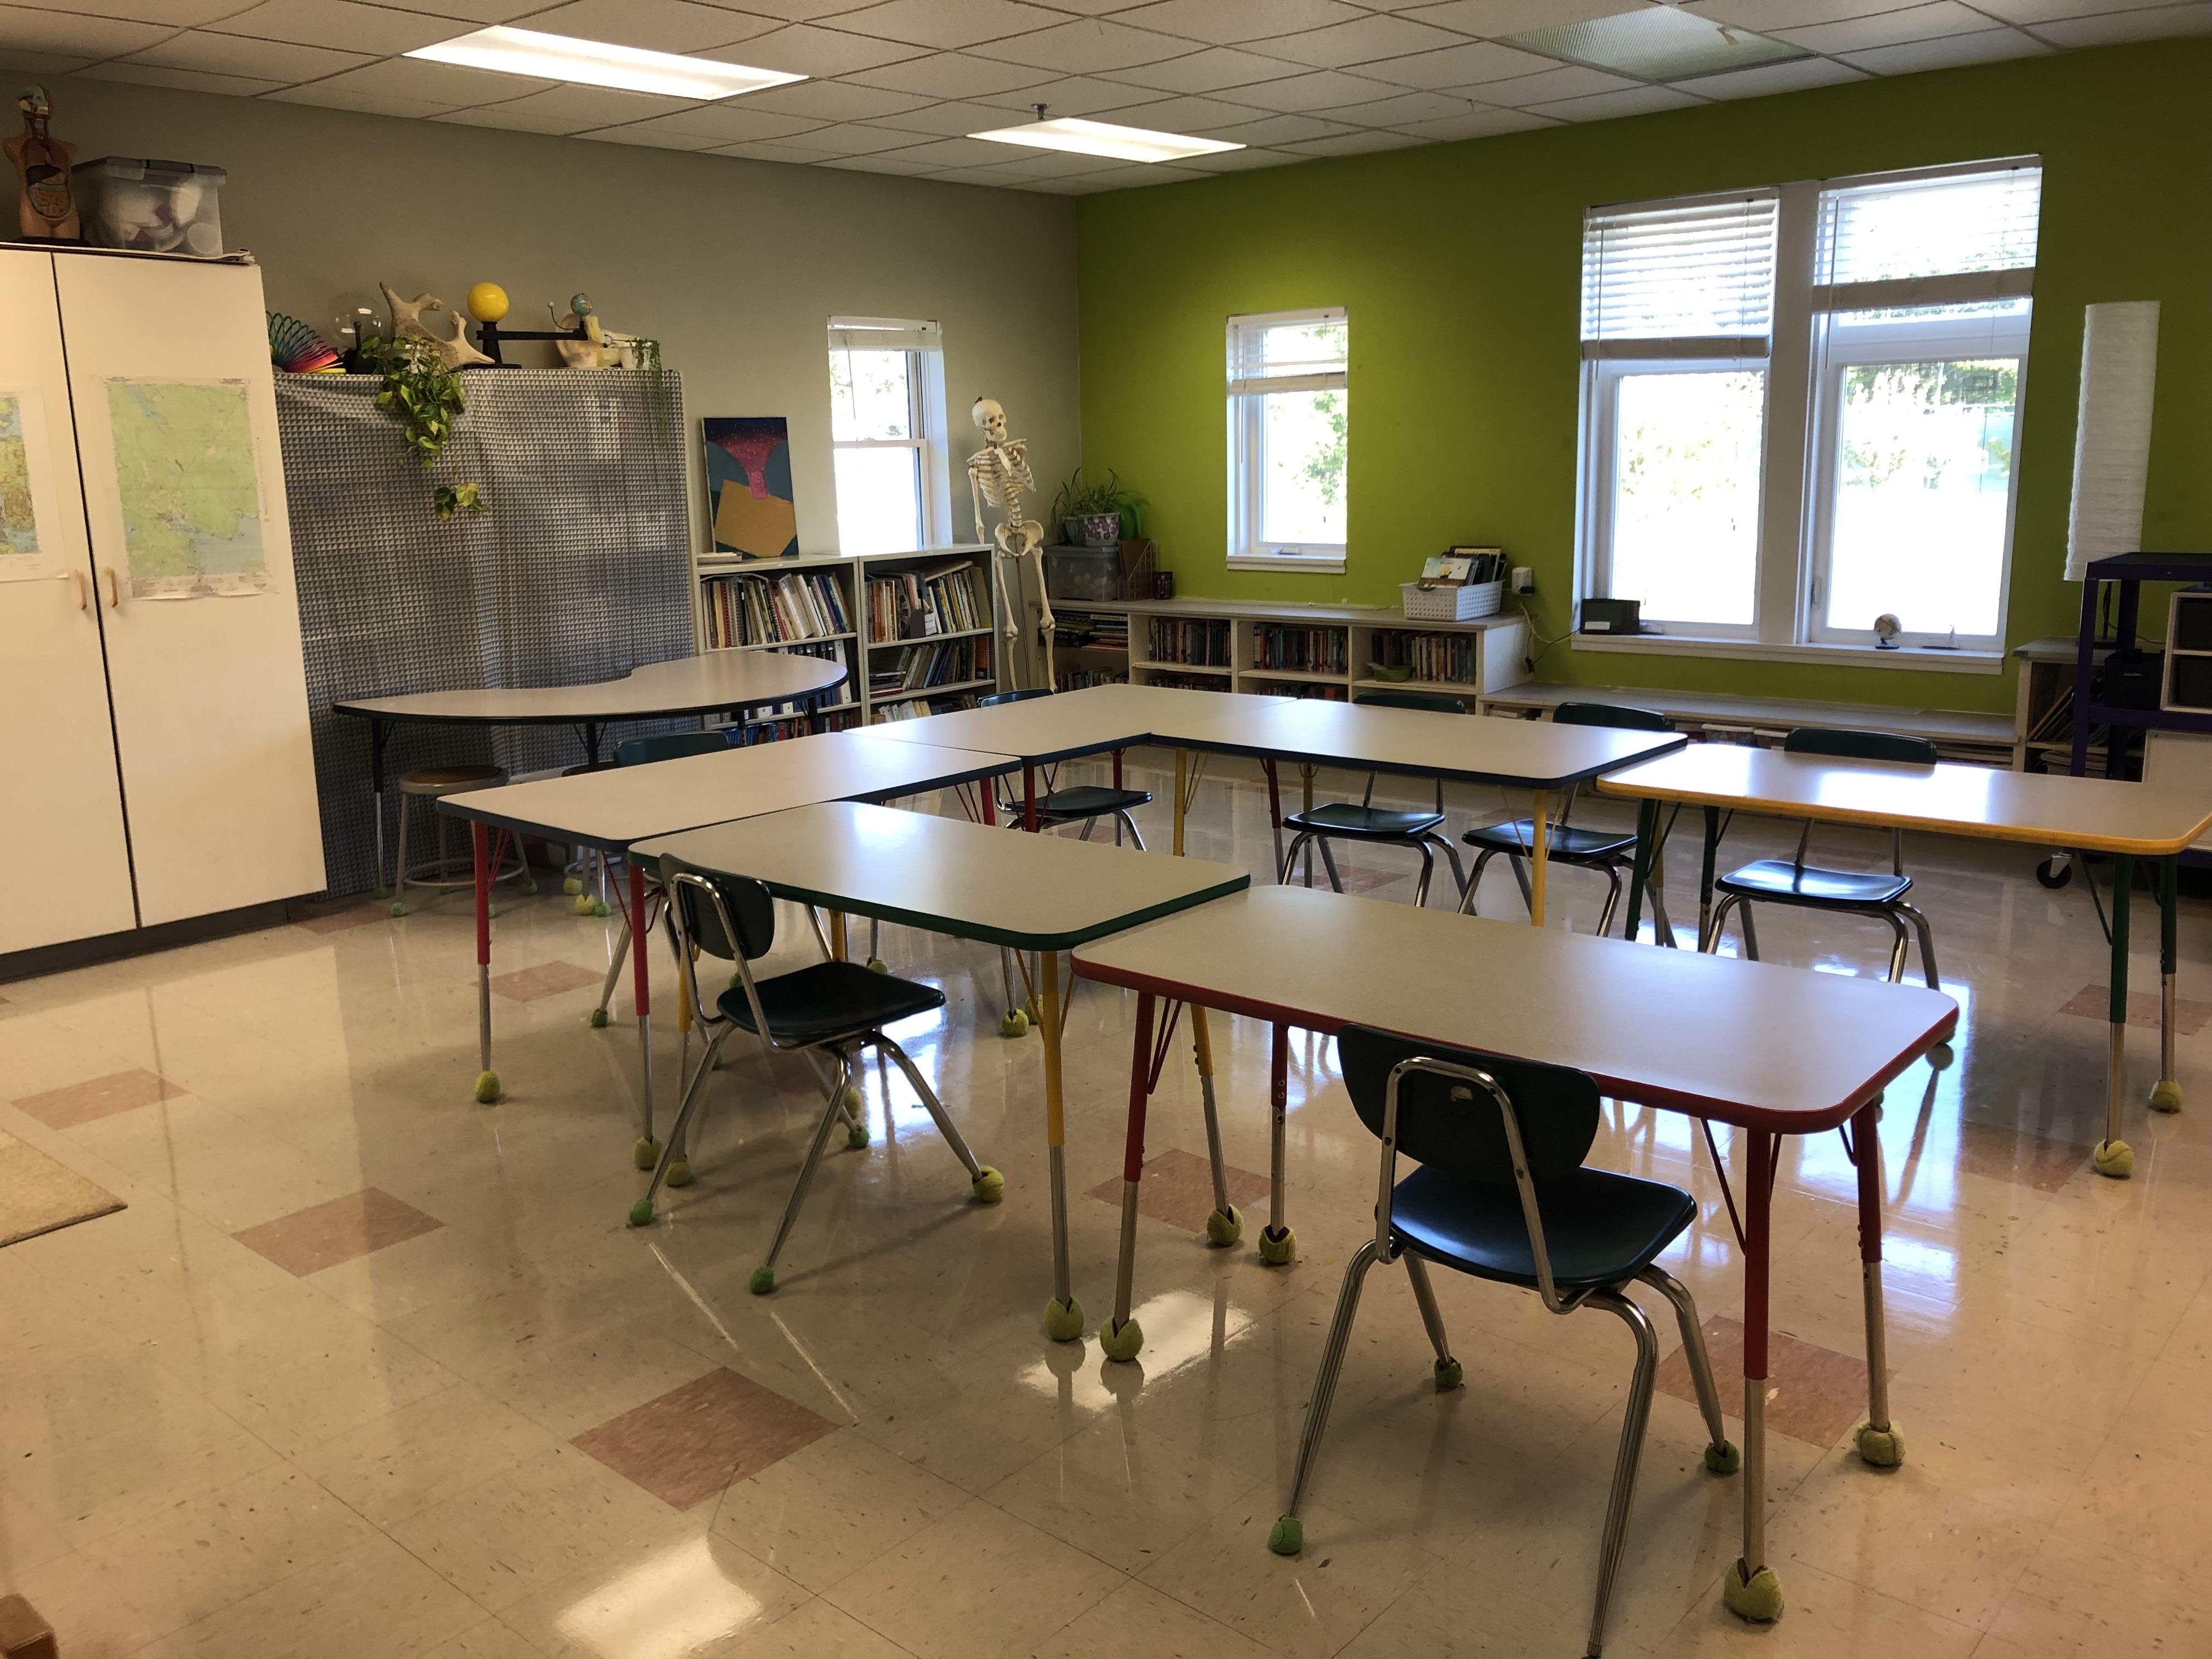 Photo of 5/6 classroom